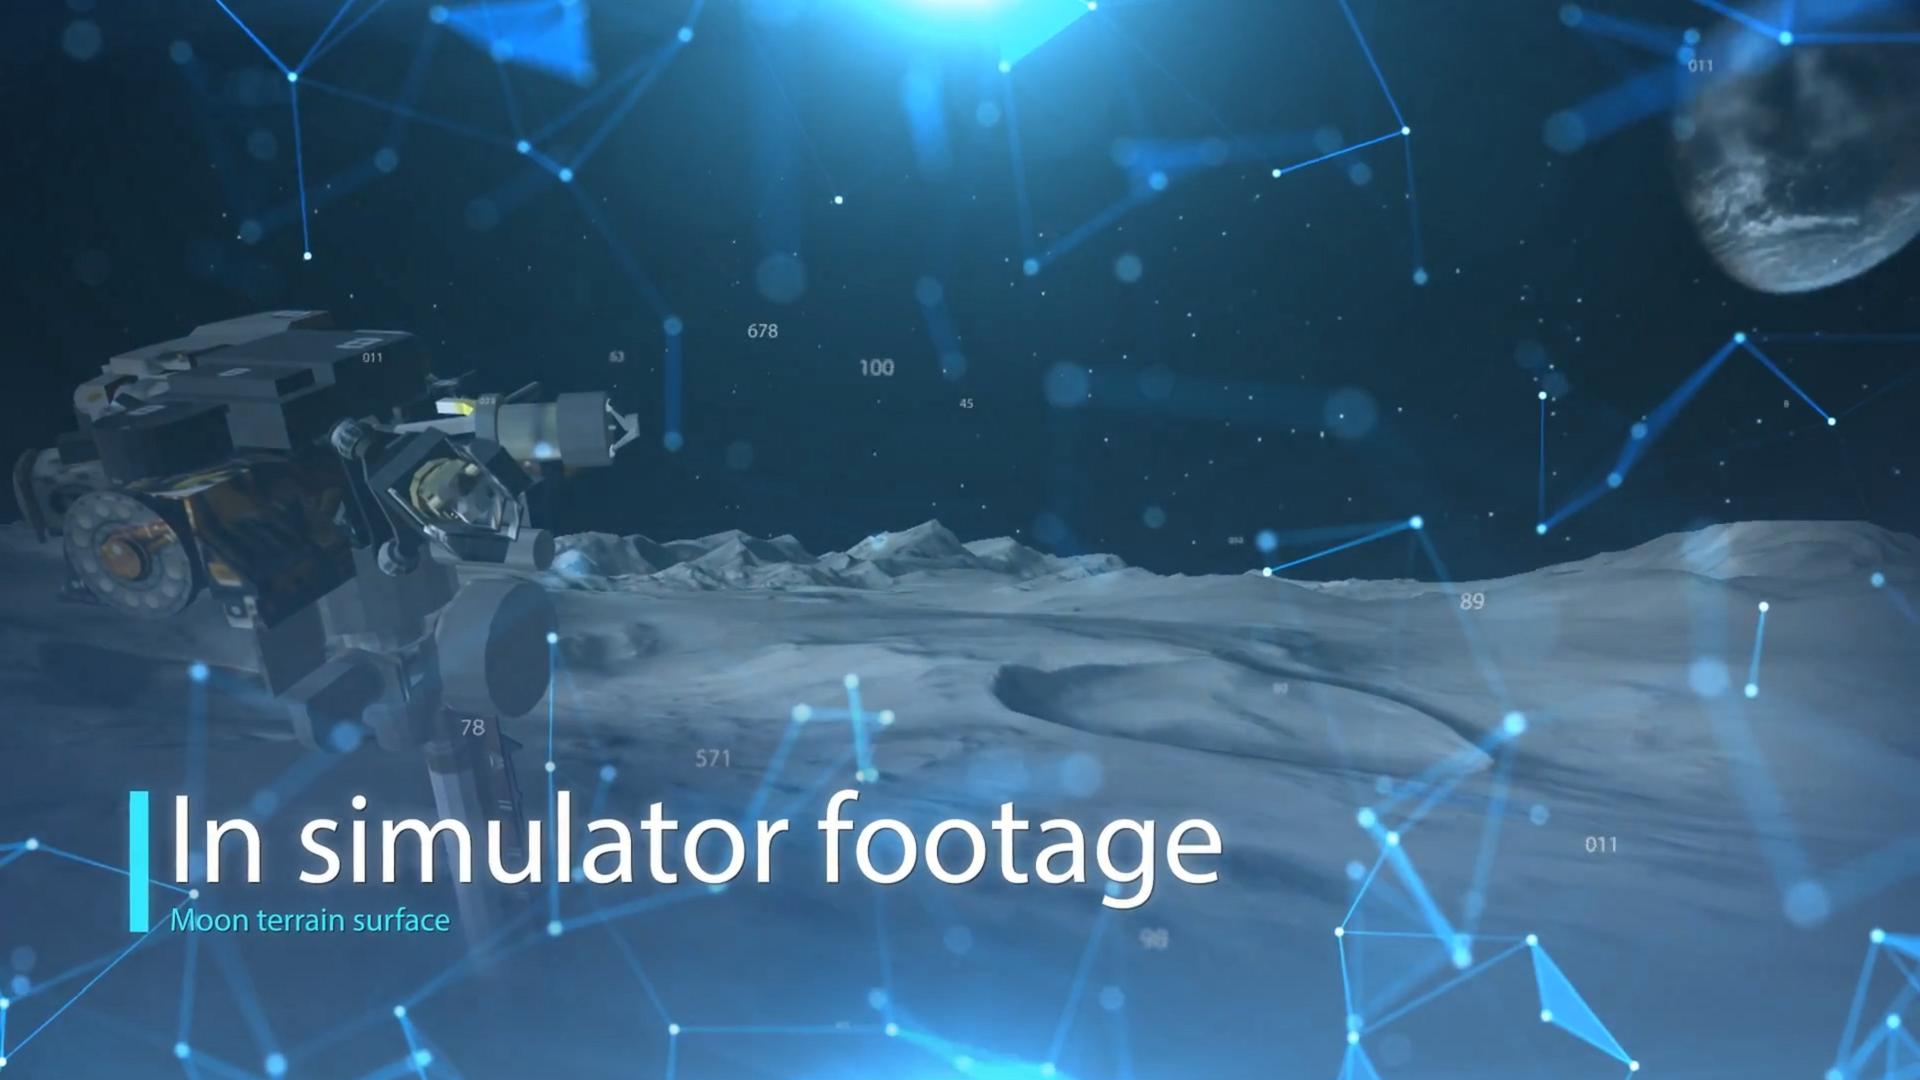 Training Simulator for Moon Missions